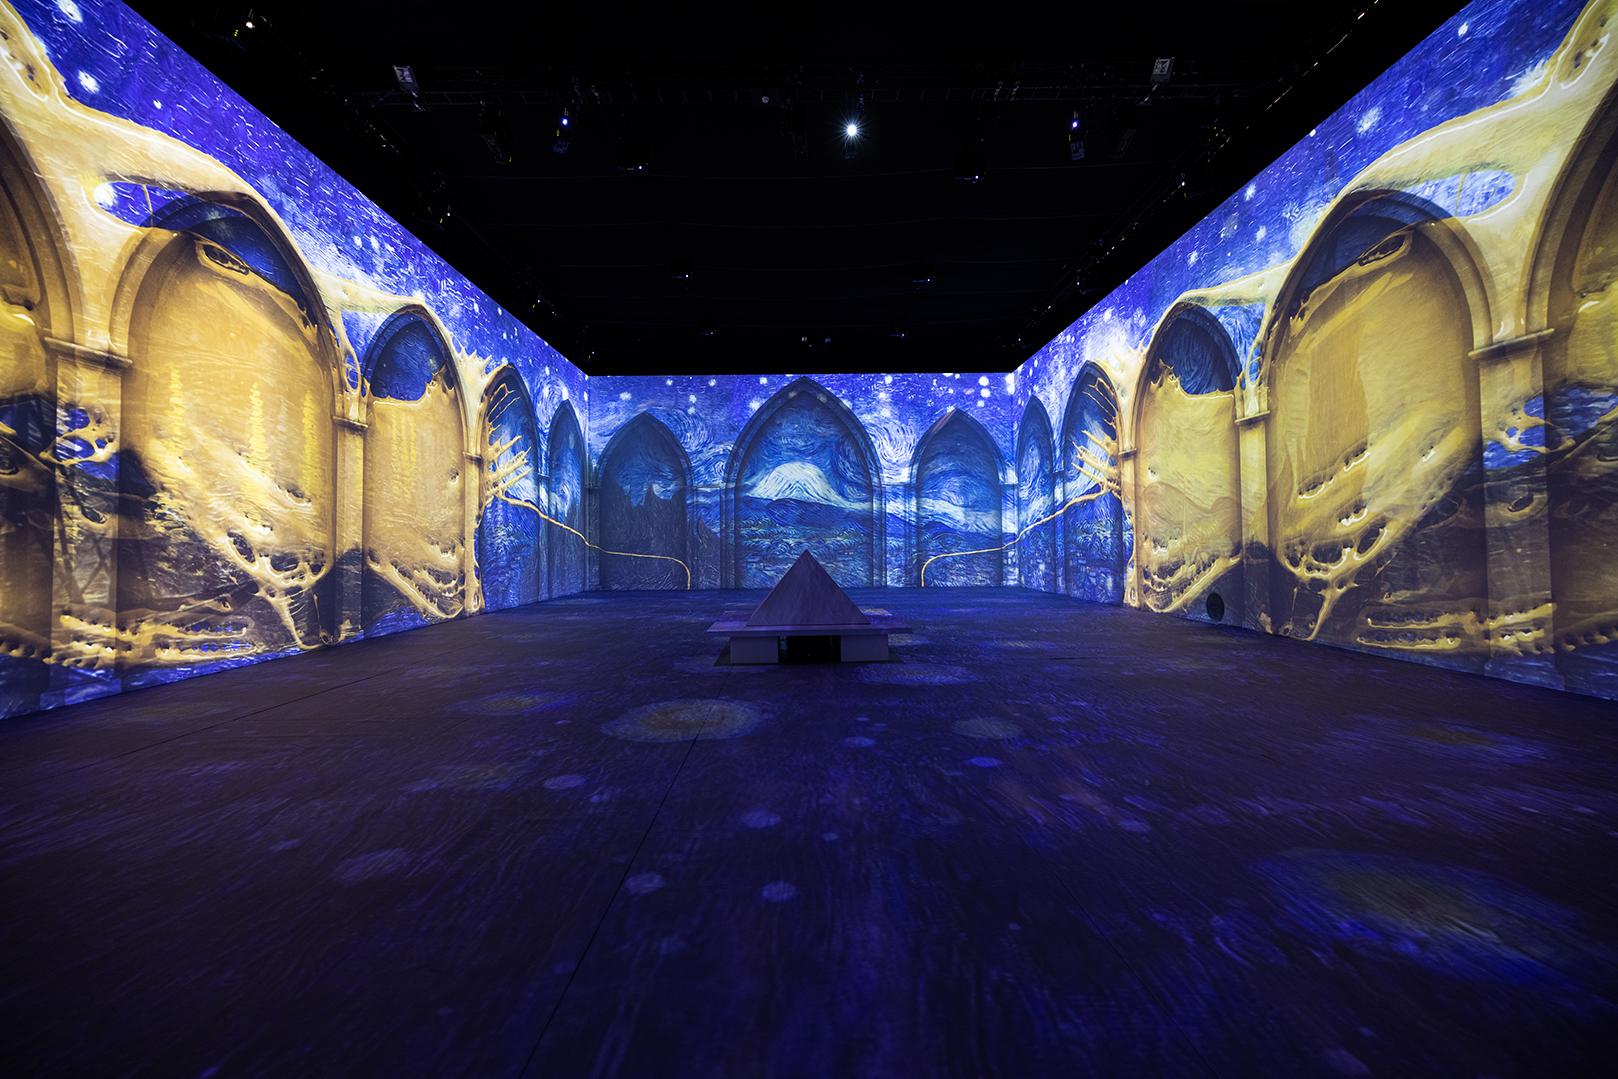 Van Gogh – The Immersive Experience